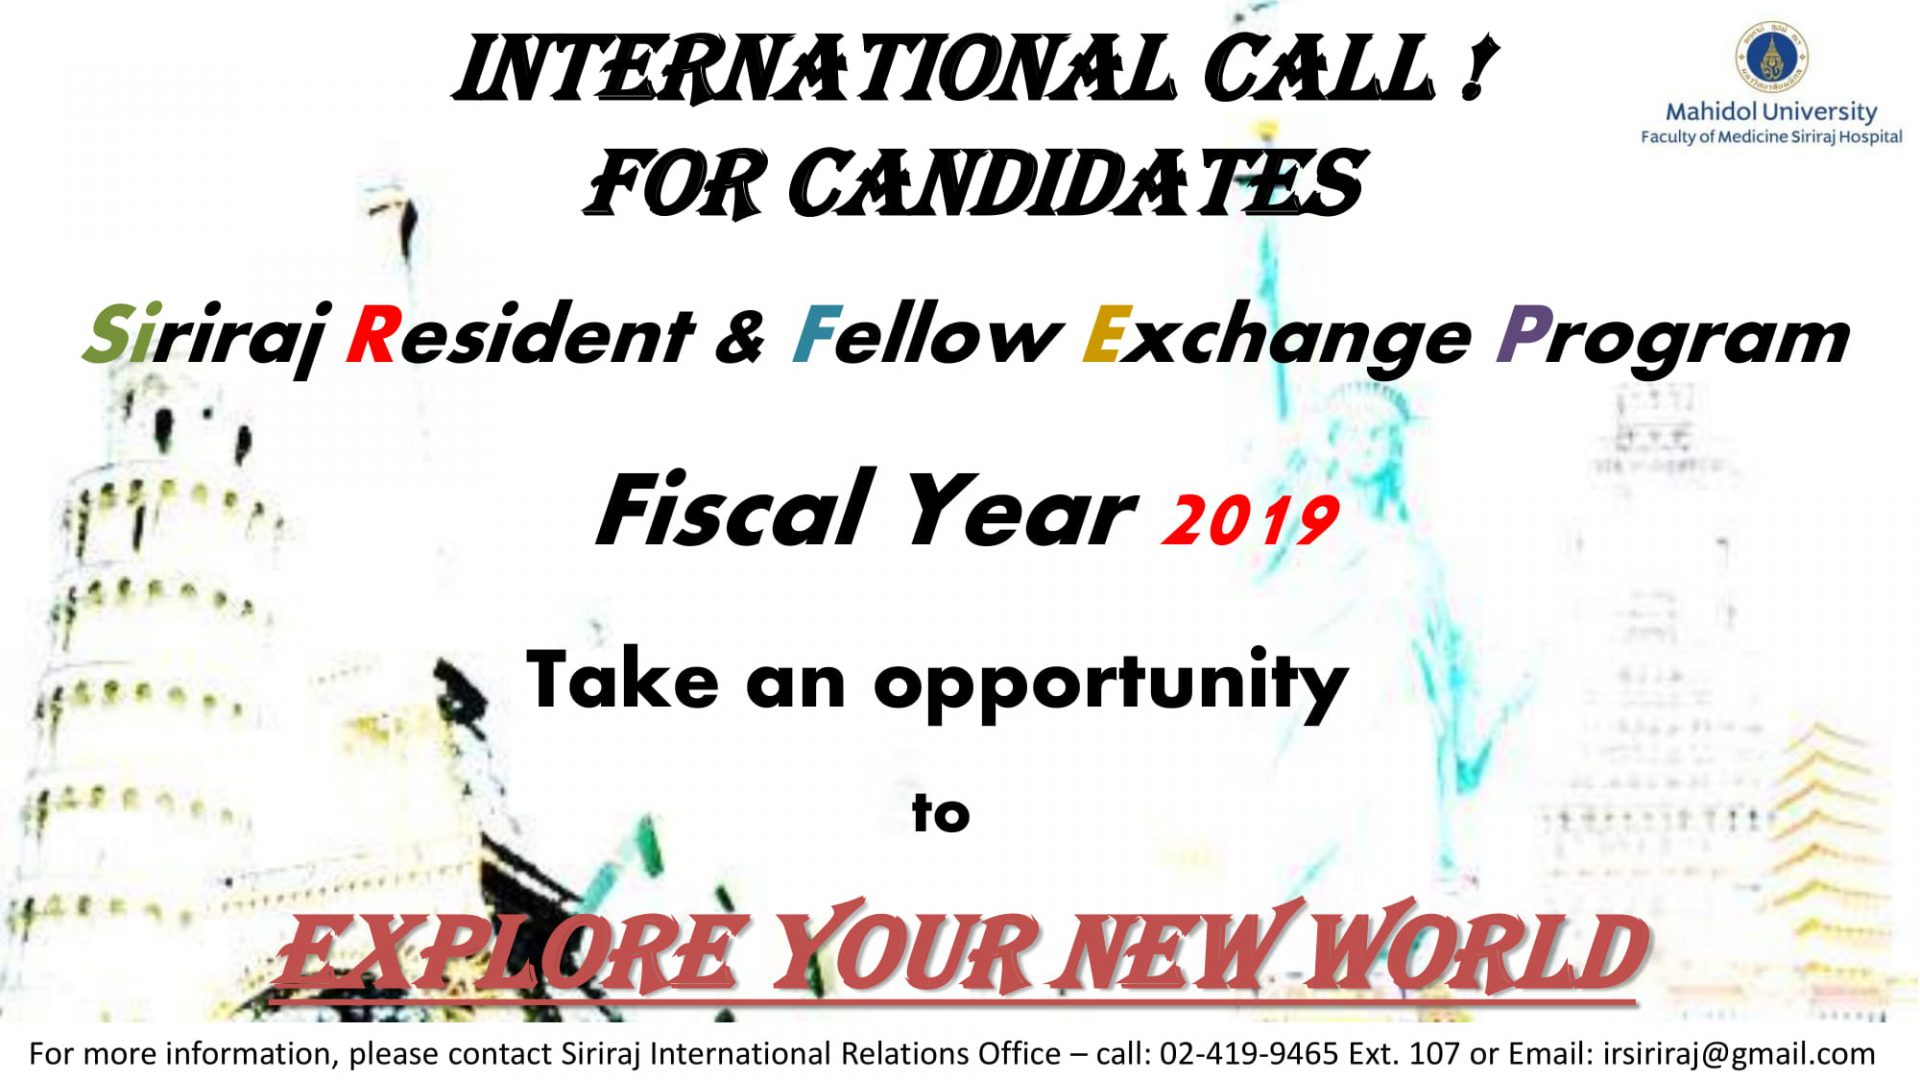 Siriraj Resident & Fellow Exchange Program 2019